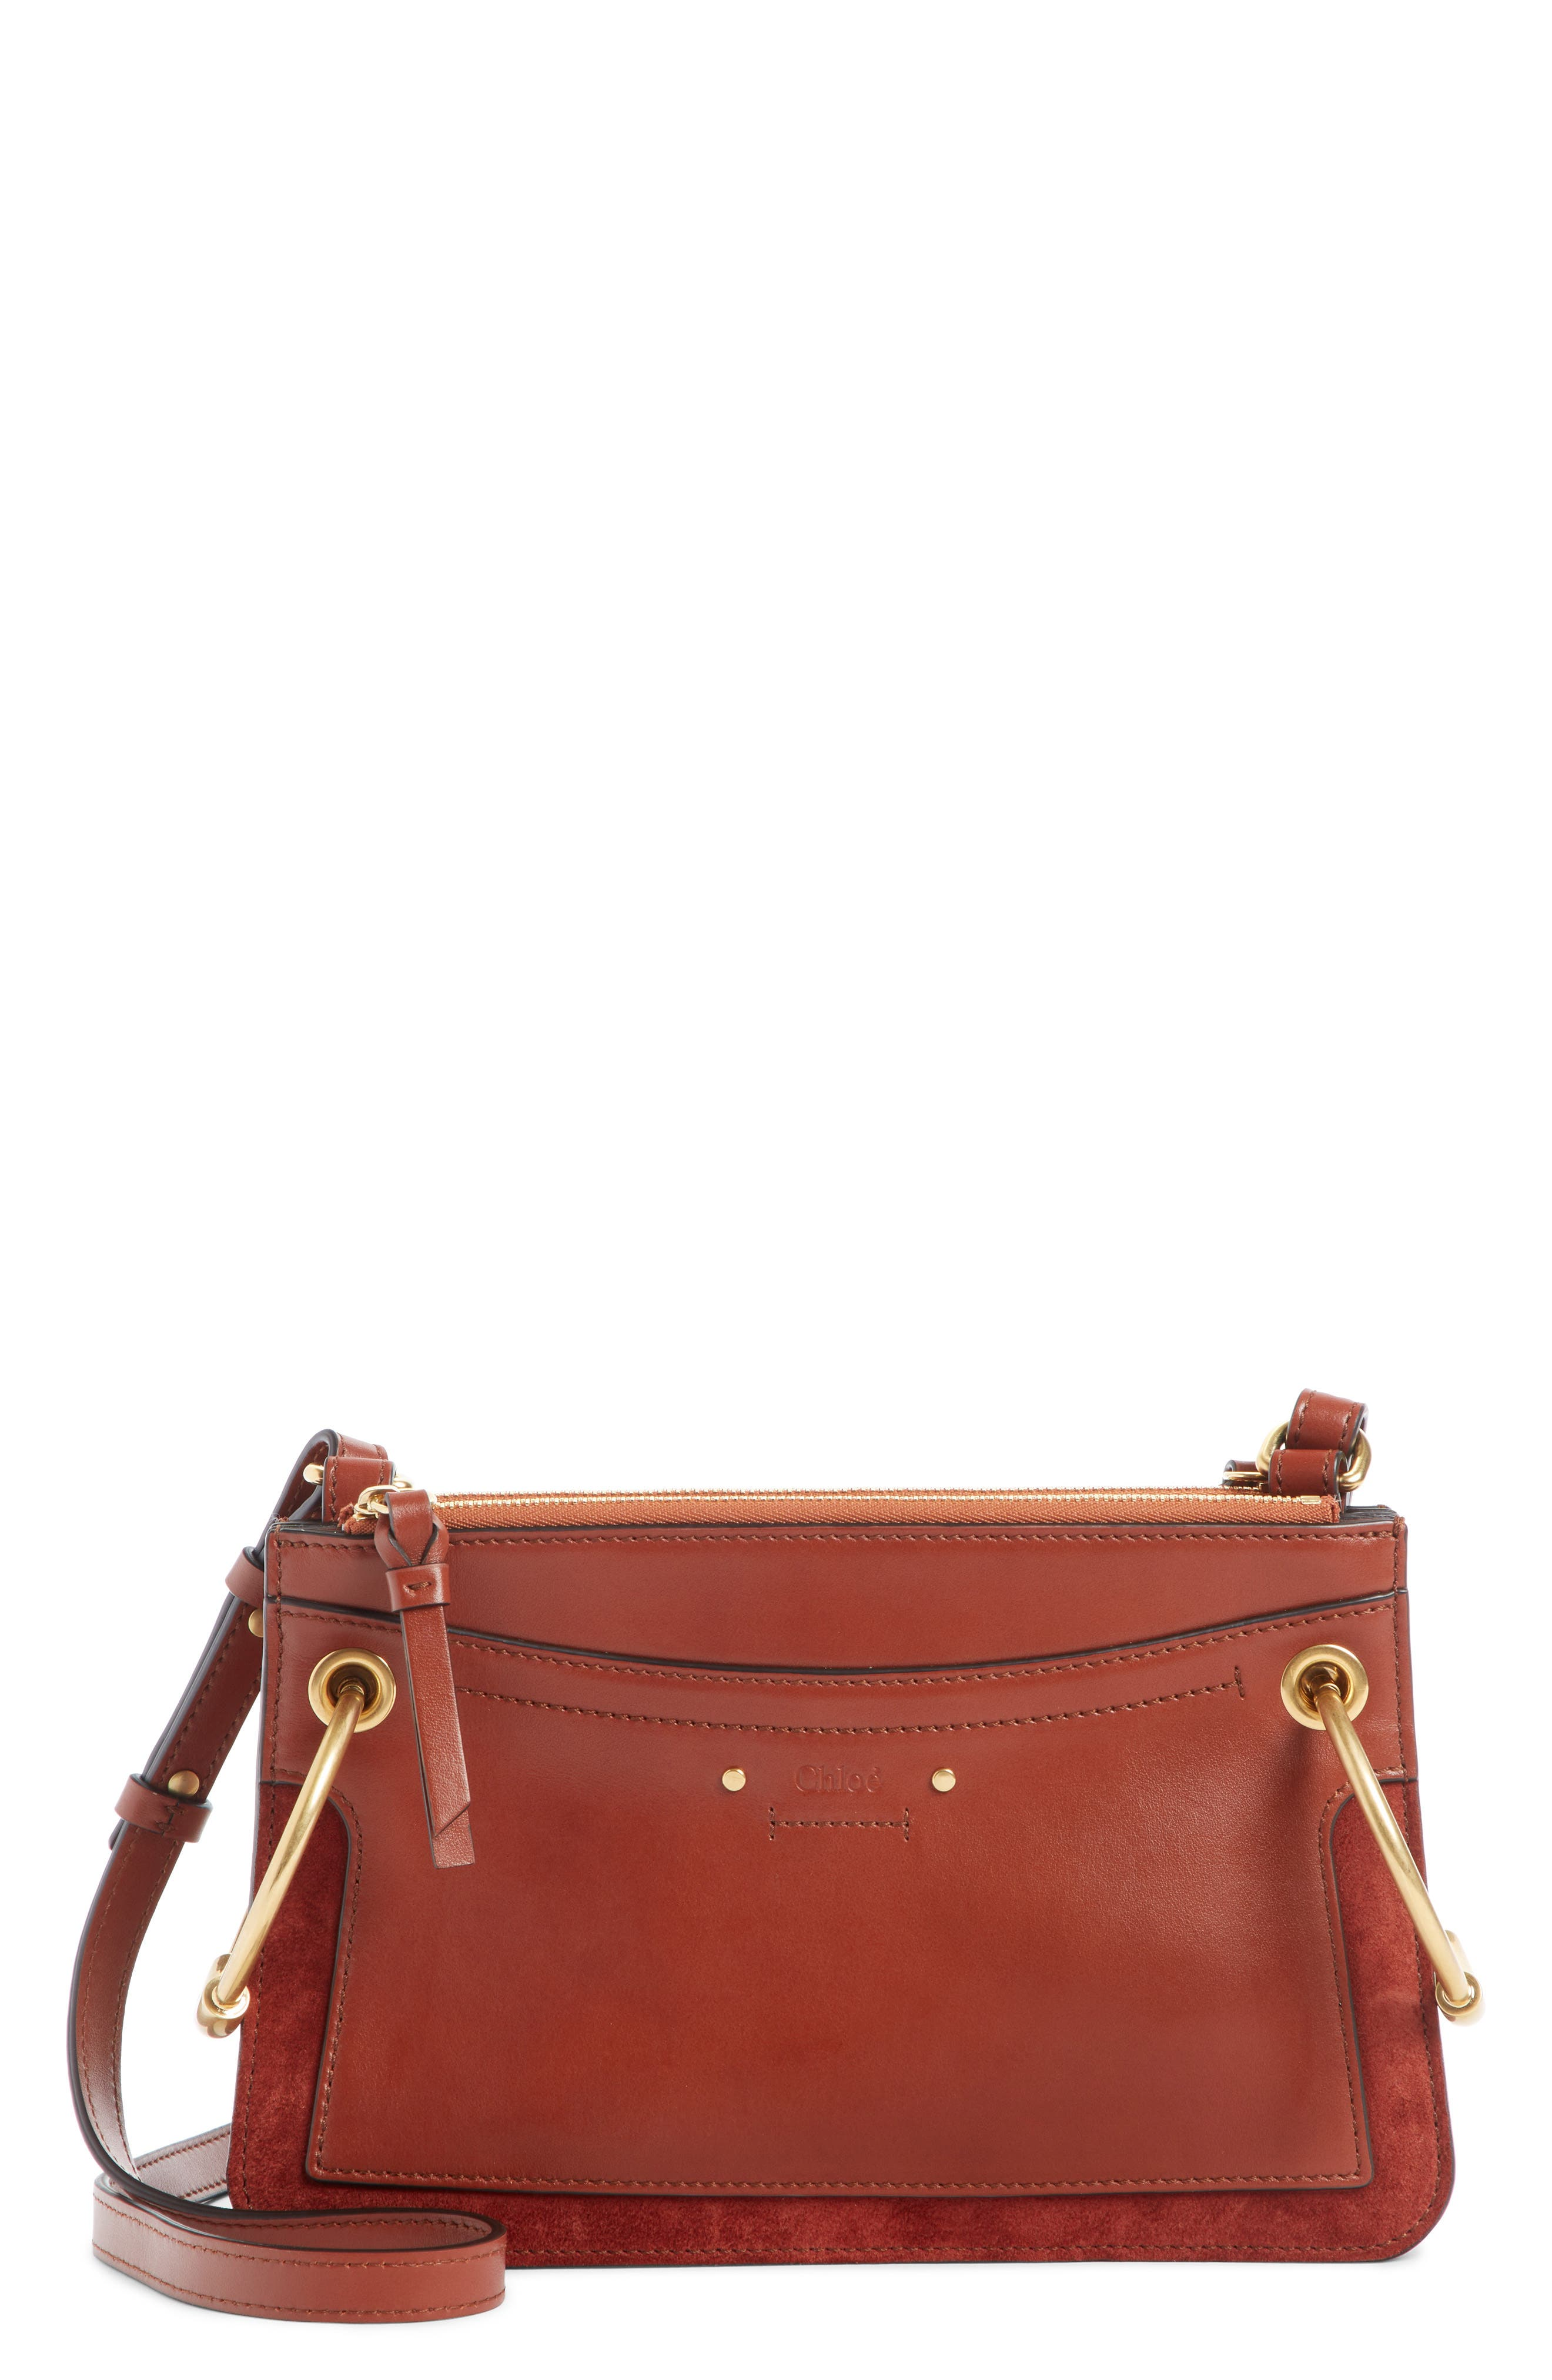 Small Roy Leather Shoulder Bag,                             Main thumbnail 1, color,                             SEPIA BROWN